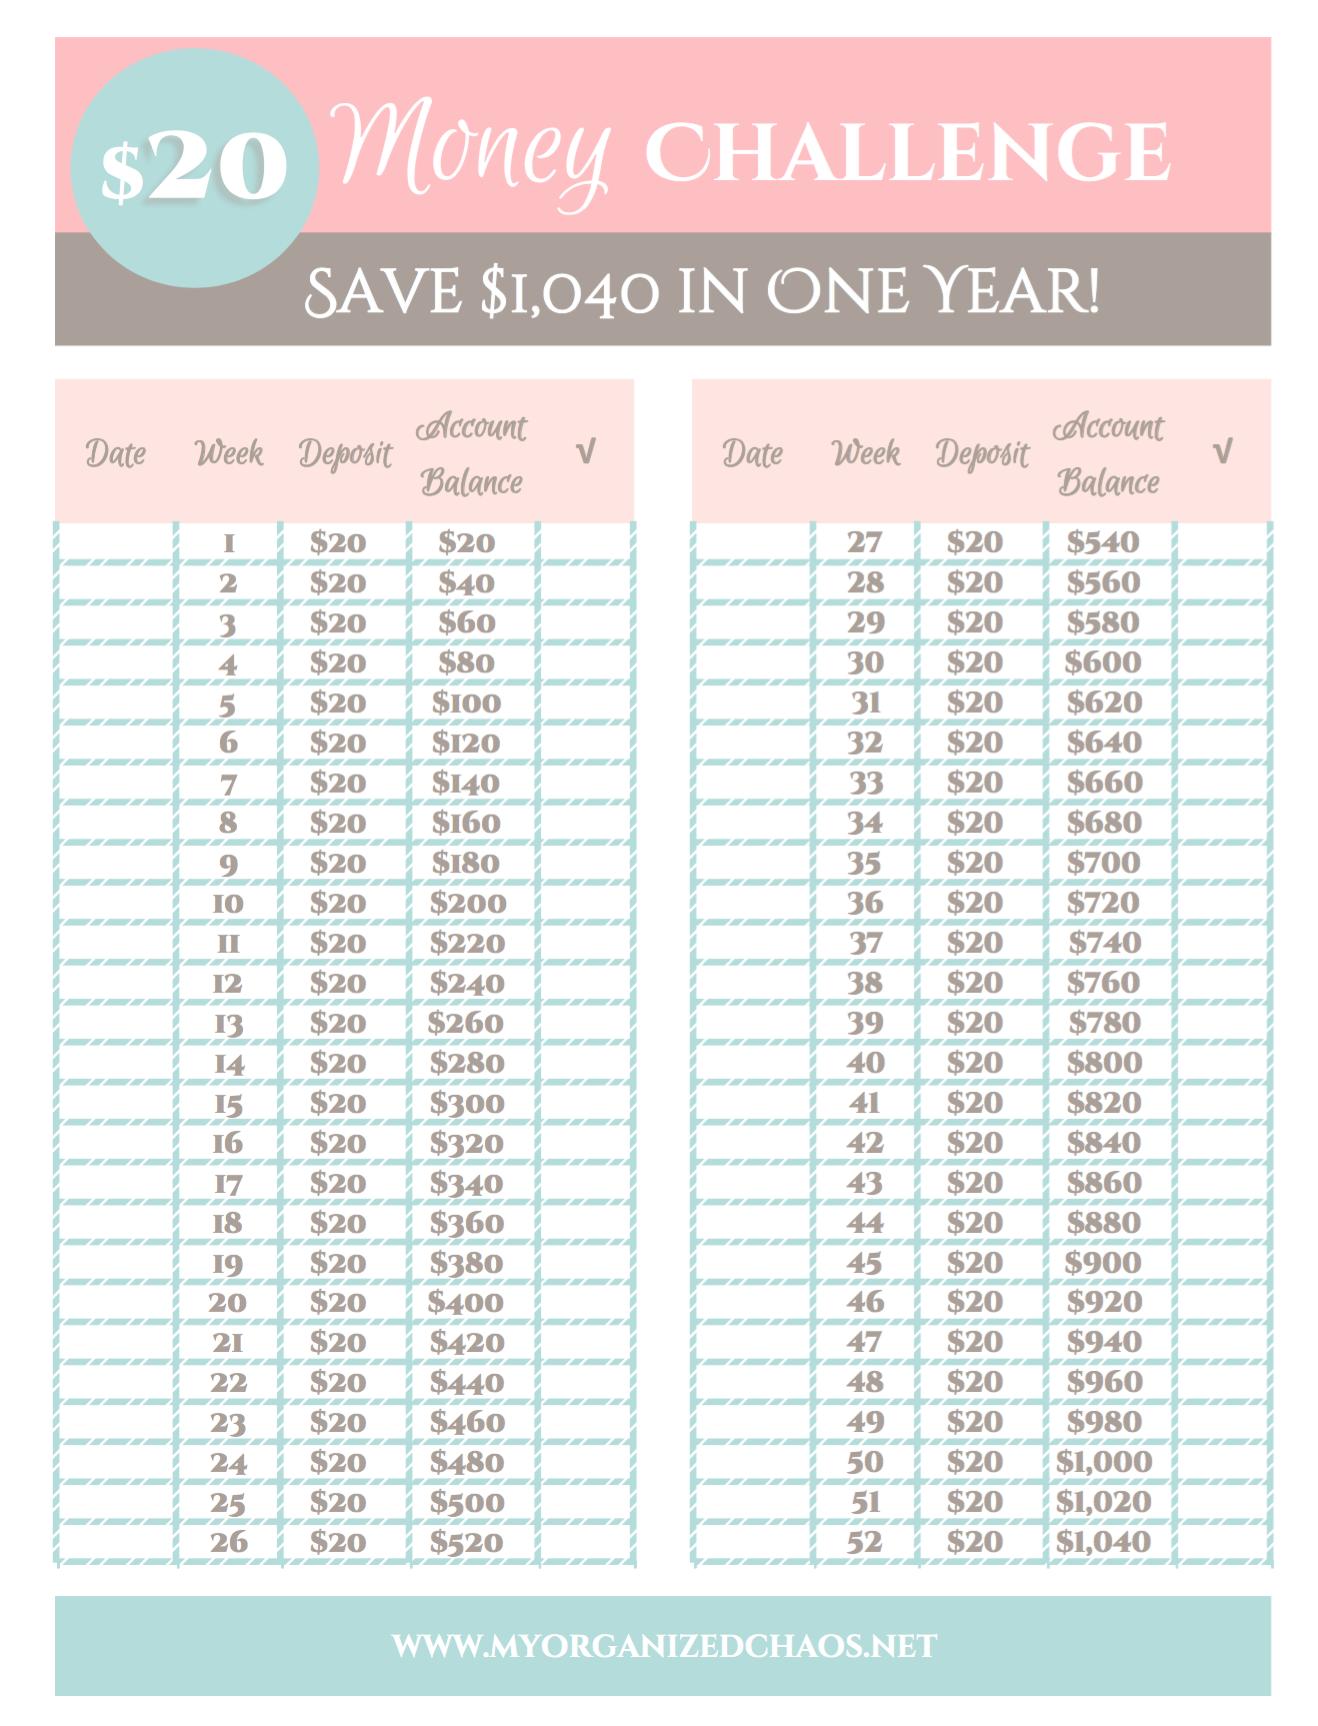 Easy Money Savings Challenge To Help You Easily Save